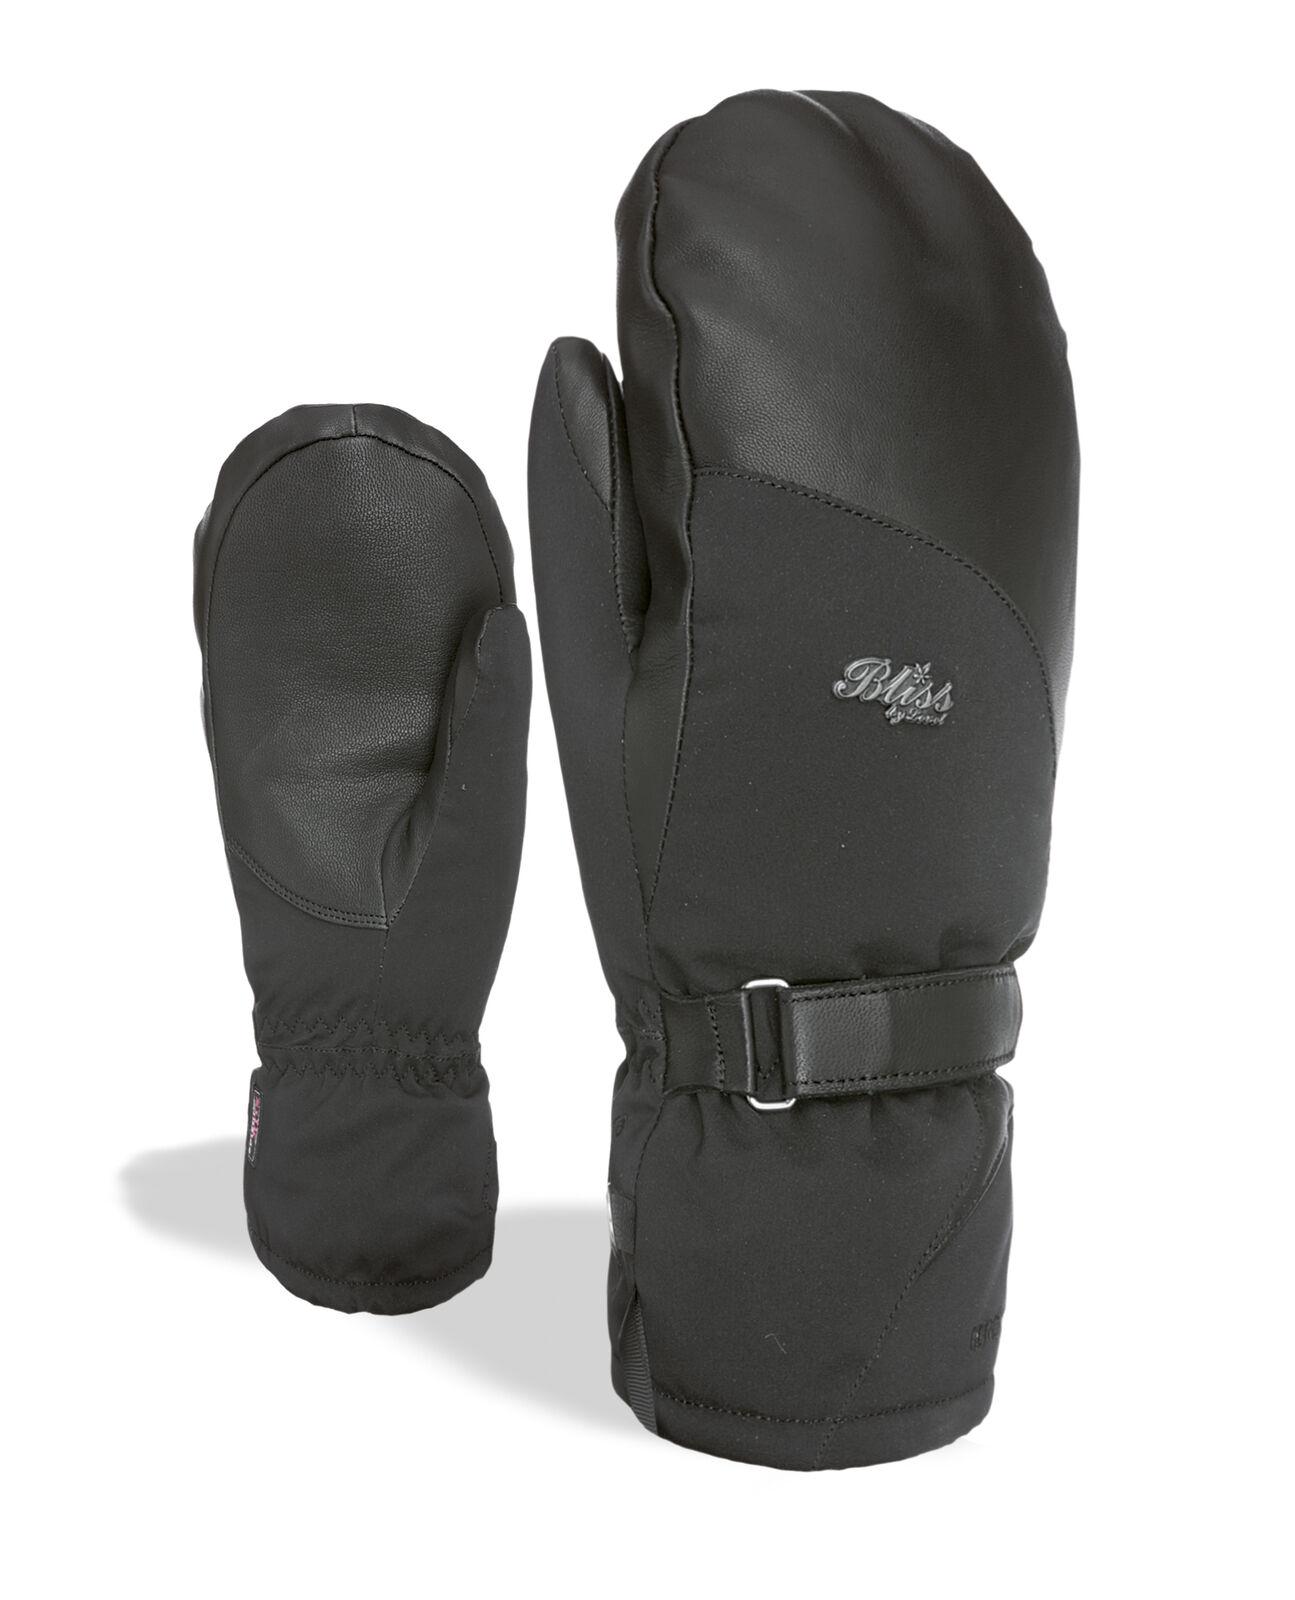 Level Handschuh Bliss  Crystal Mitt Gore-Tex black winddicht wärmend  the cheapest